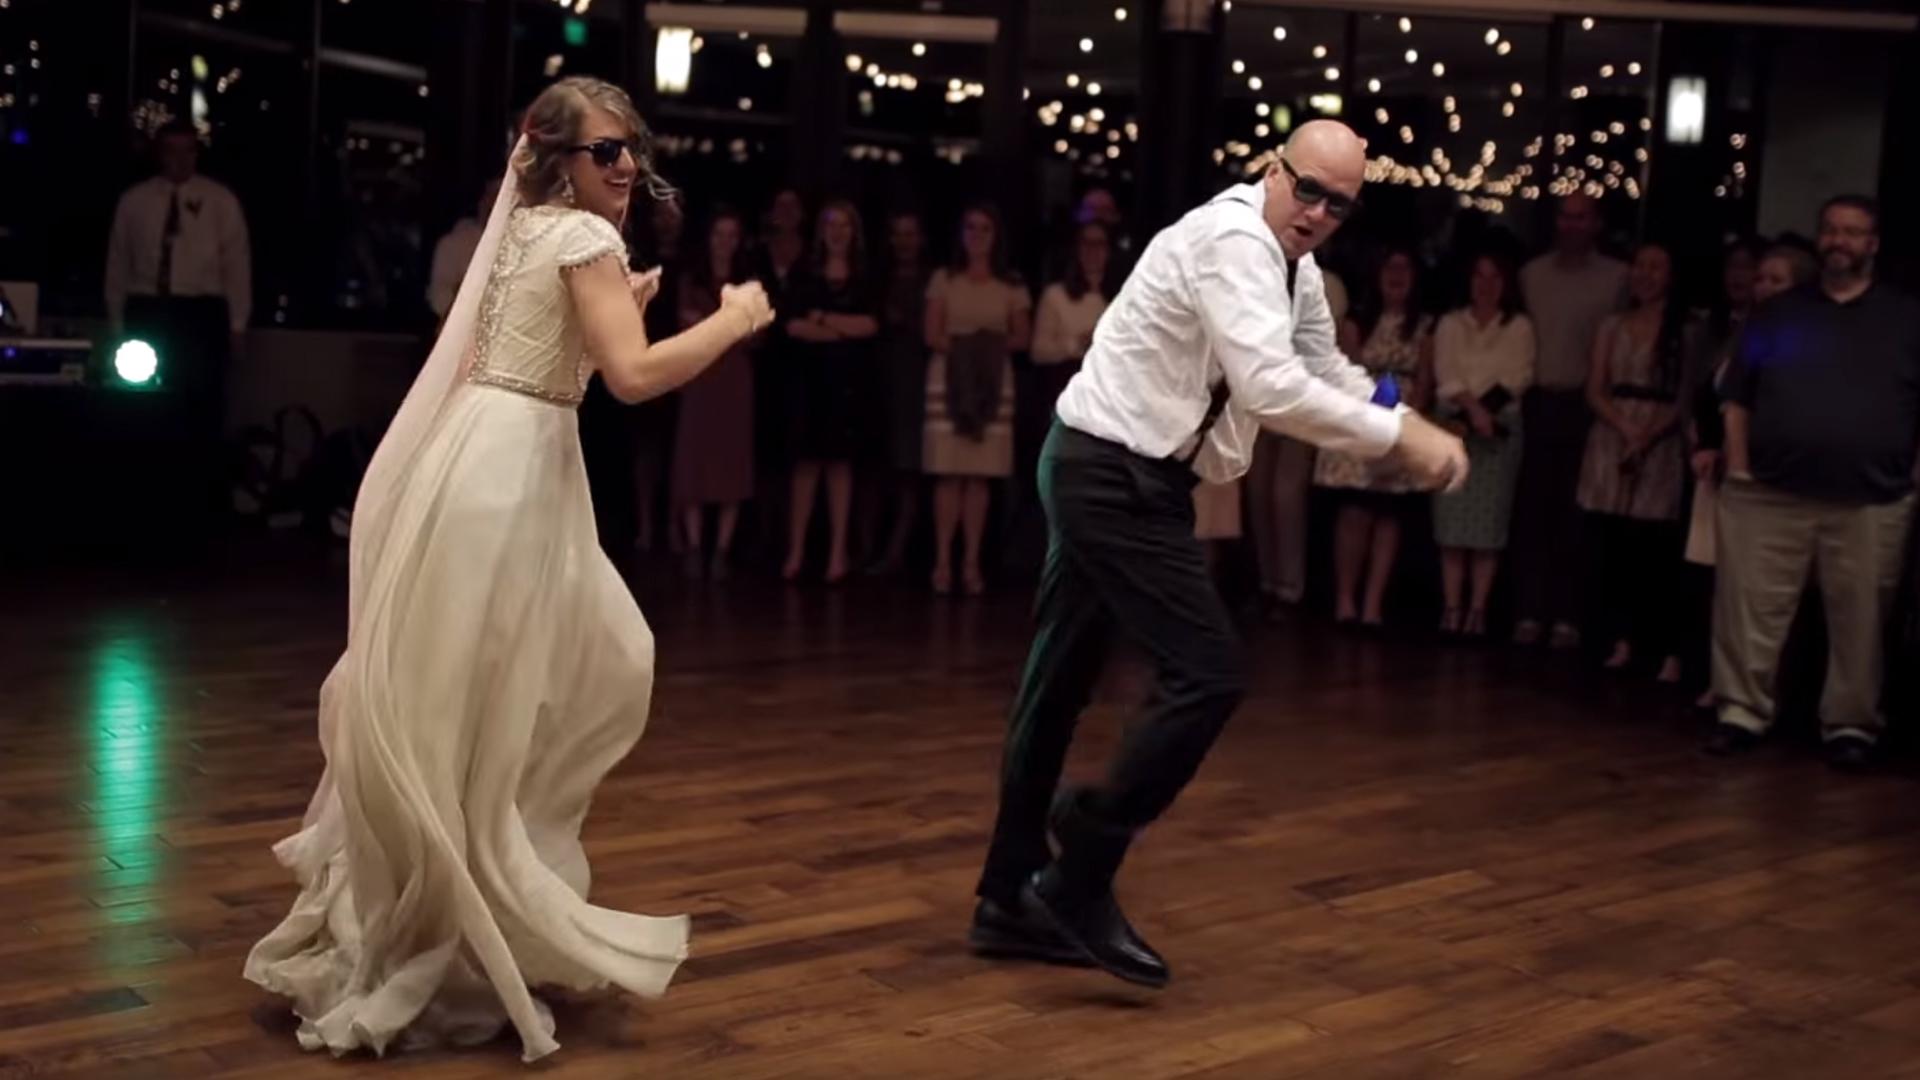 wedding dance essay